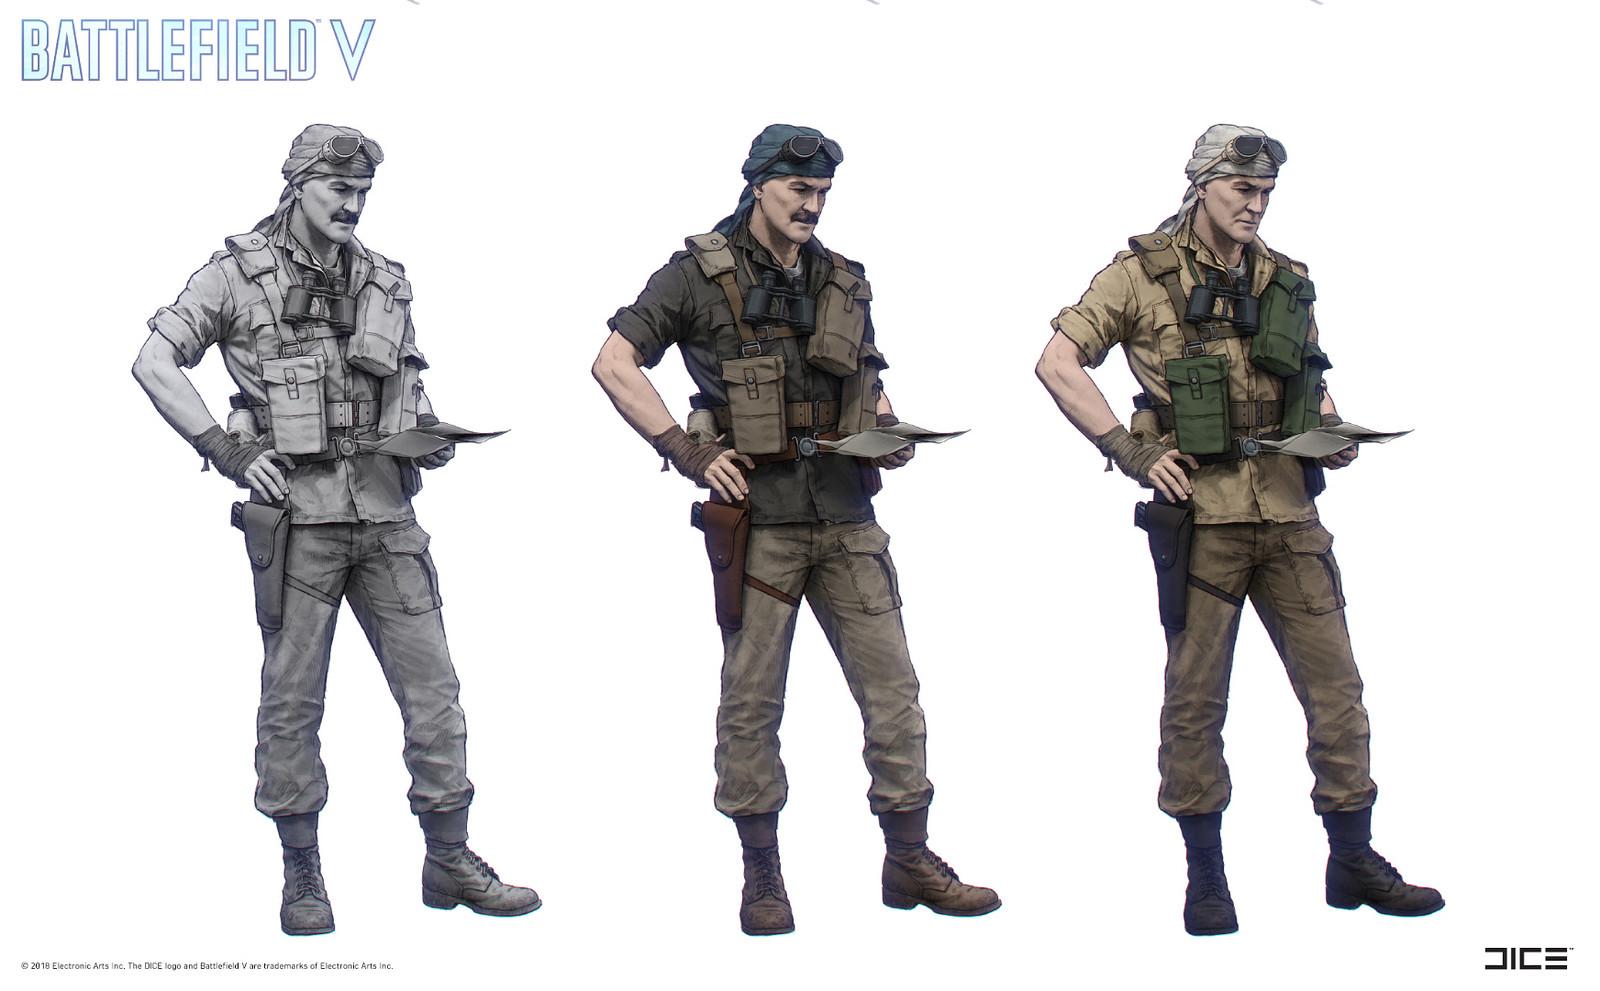 """Battlefield V"" - Under No Flag, Mason - Character concept art"